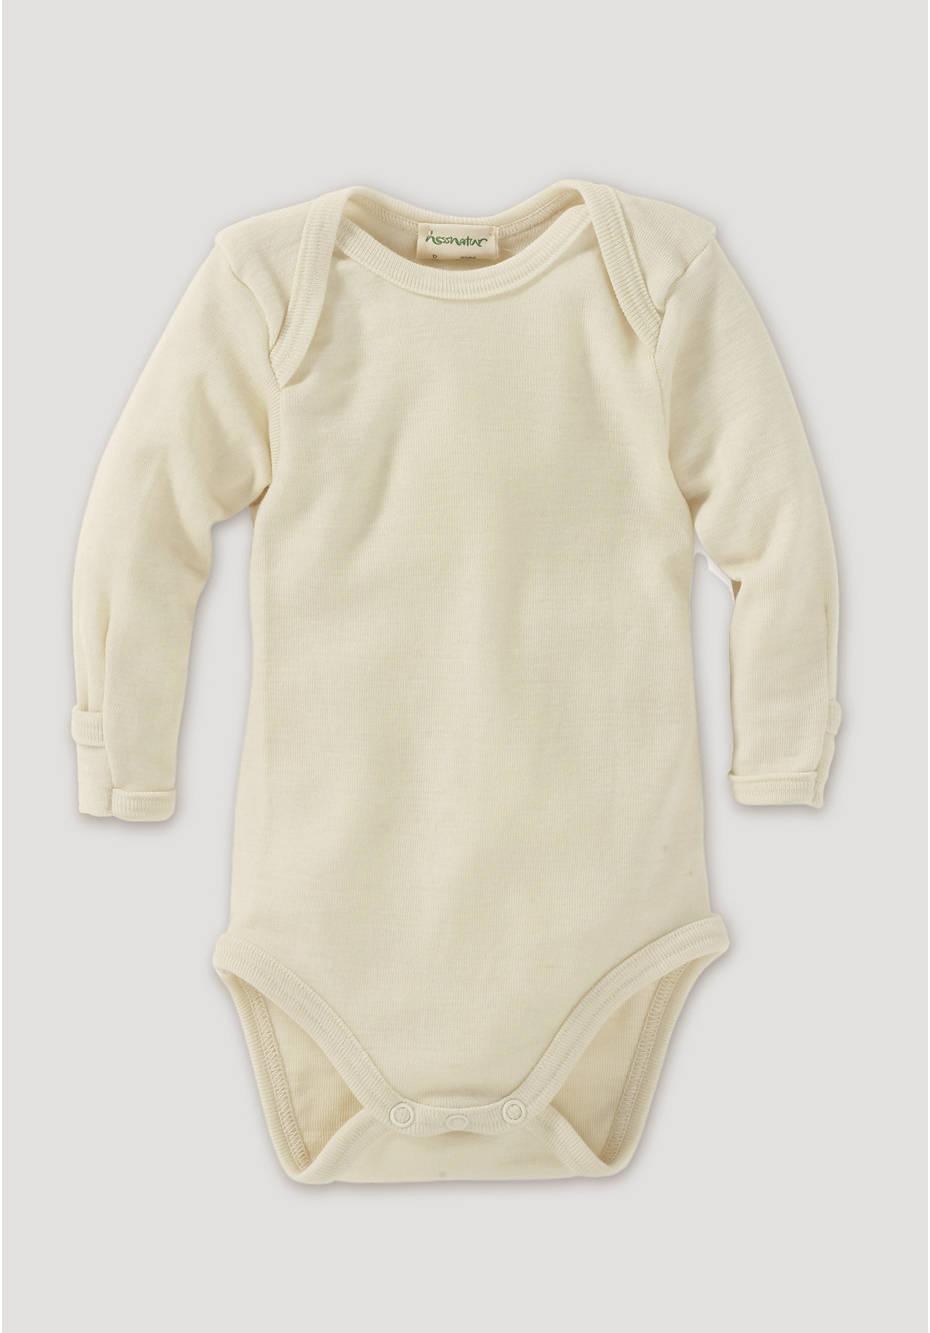 Long-sleeved body made of organic merino wool with silk